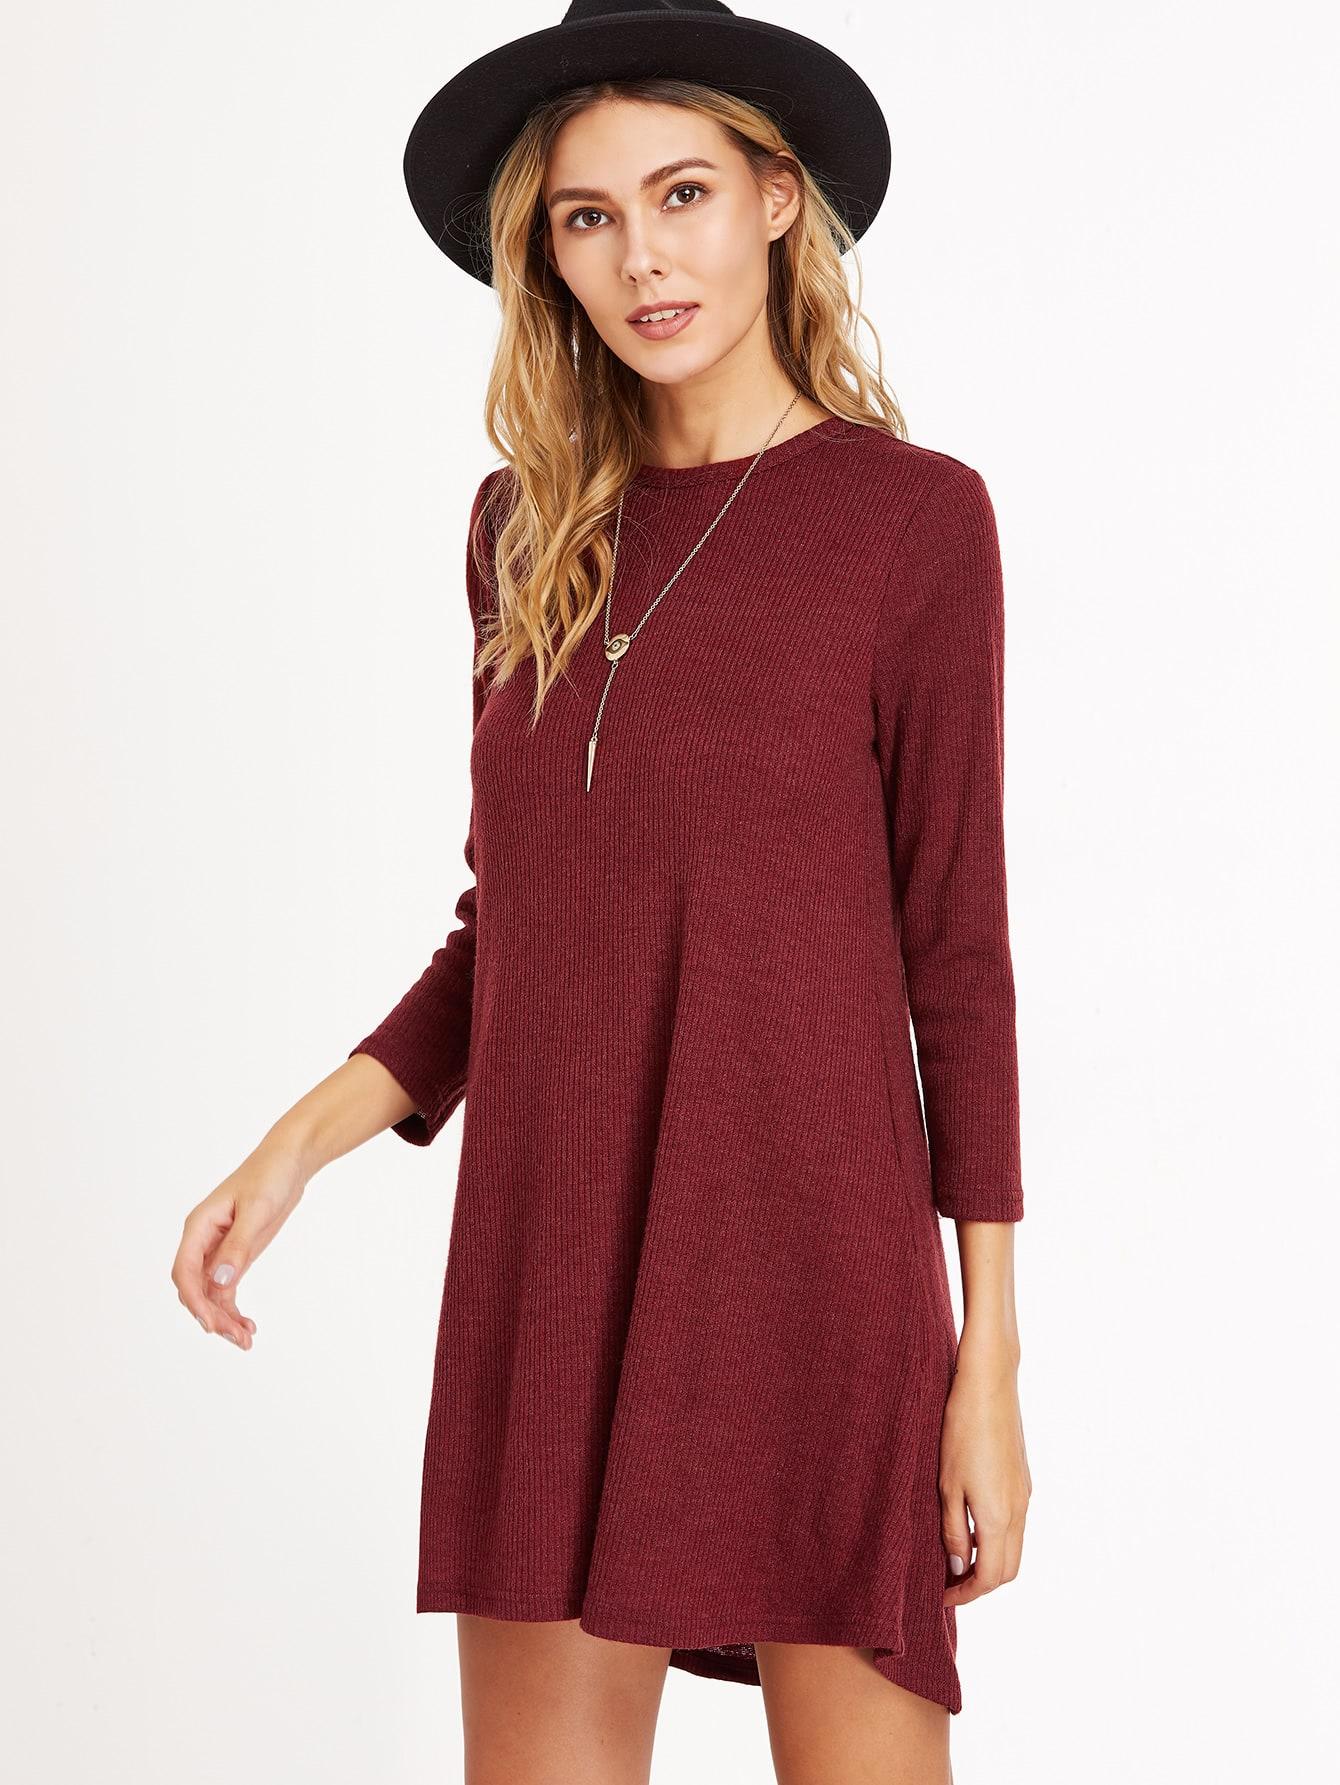 Ribbed Knit A Line Dress dress161111718